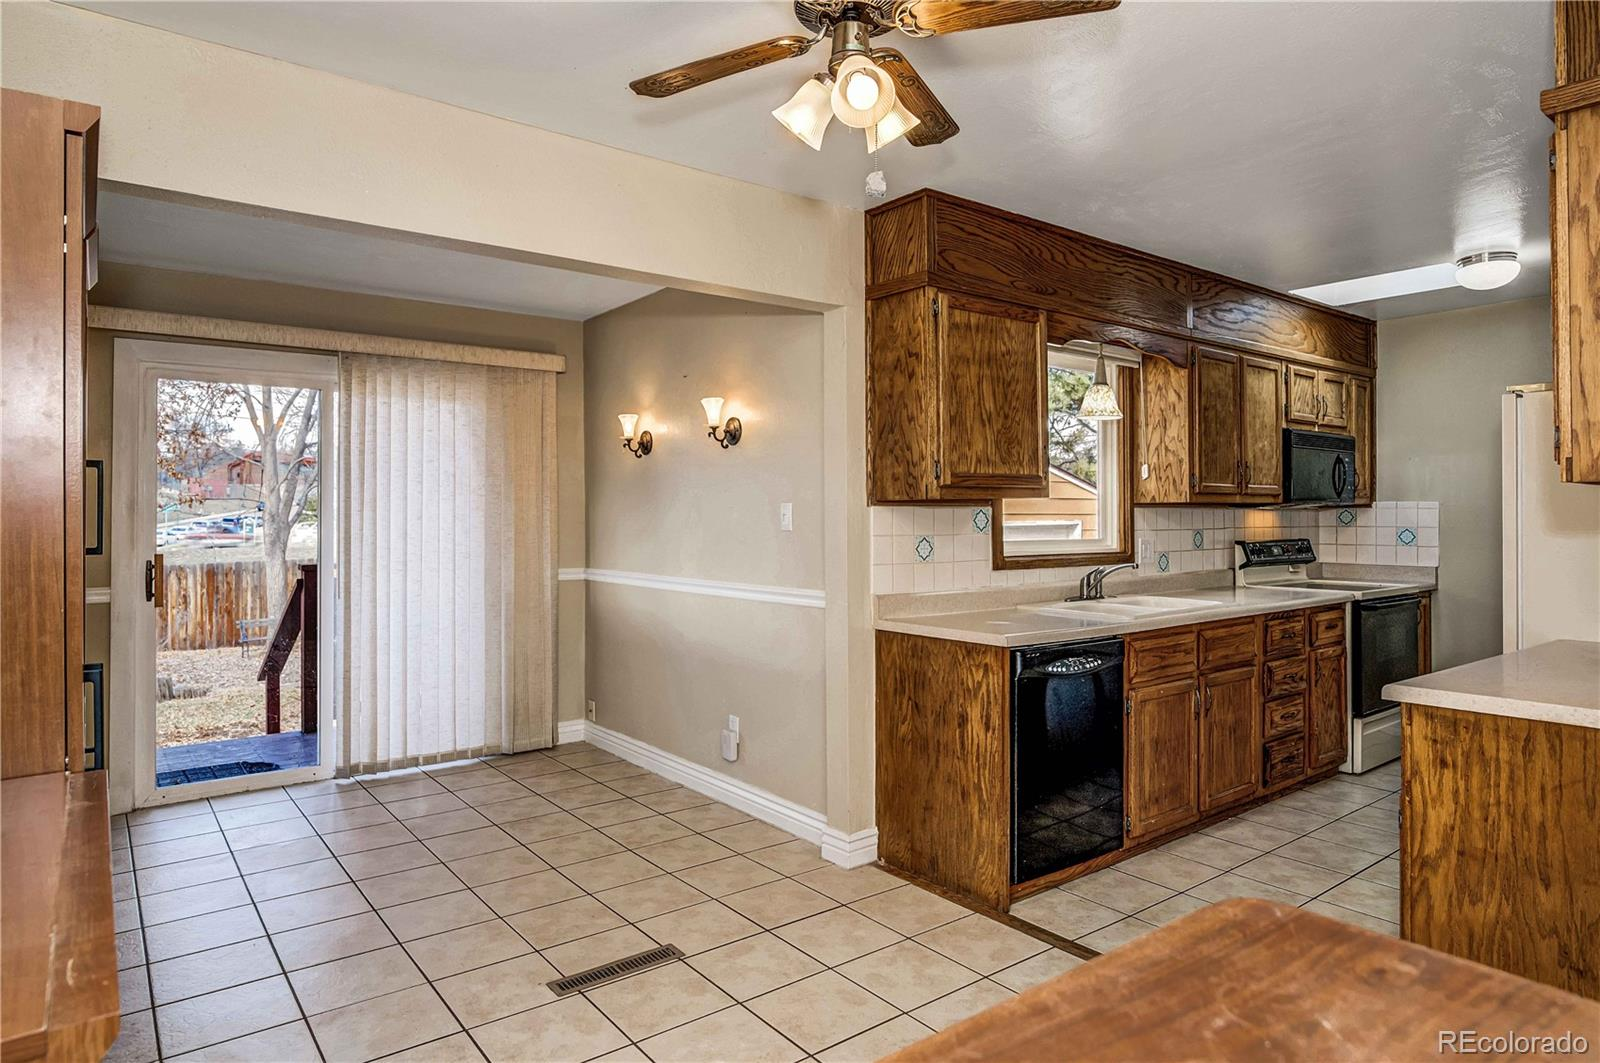 MLS# 5043109 - 10 - 1832 Northview Drive, Colorado Springs, CO 80909